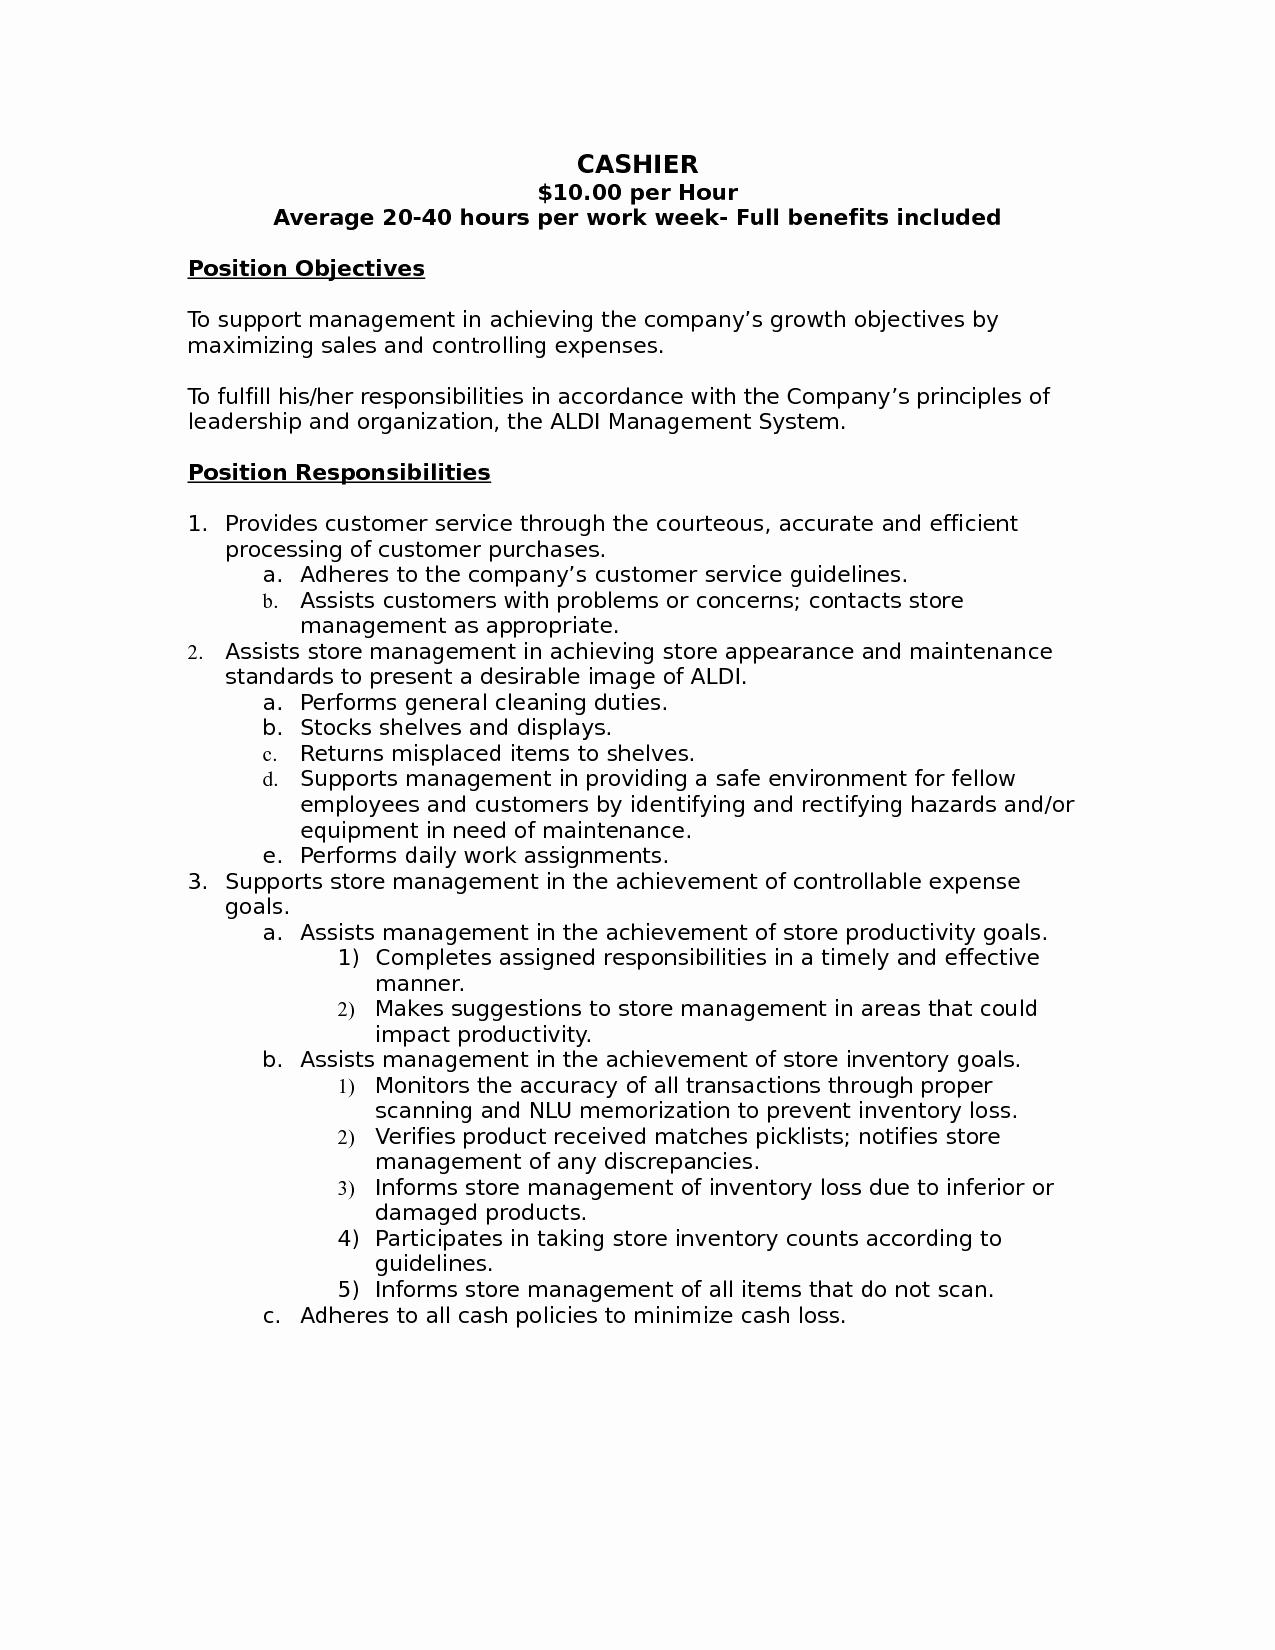 10 Cashier Job Description For Resume Sample Latter Example Template